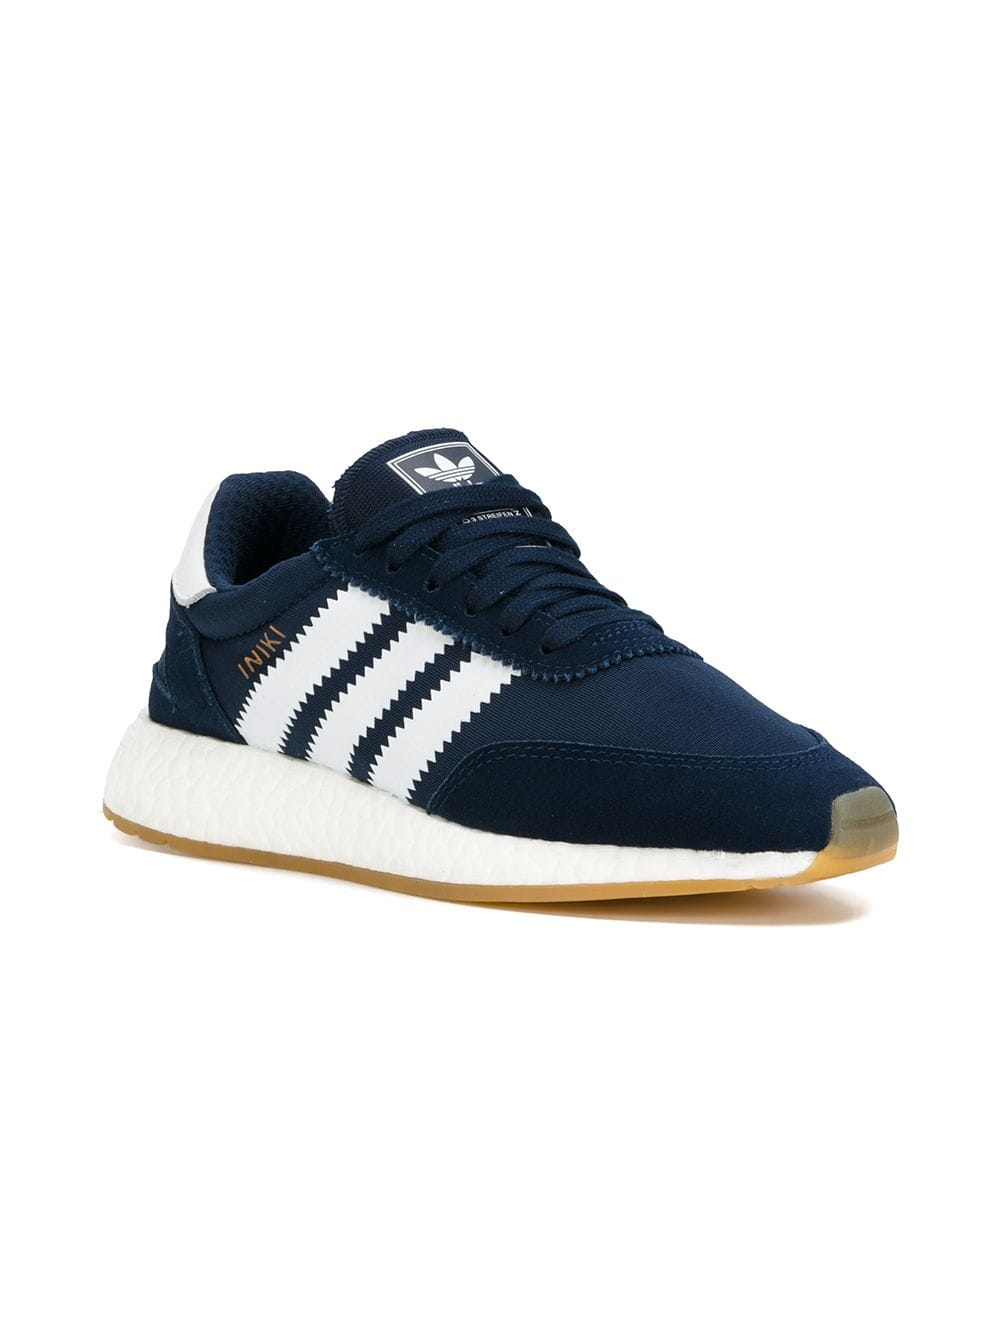 3010c3a352d Adidas adidas Originals Iniki Runner sneakers (blauw) | BY9729 | adidas